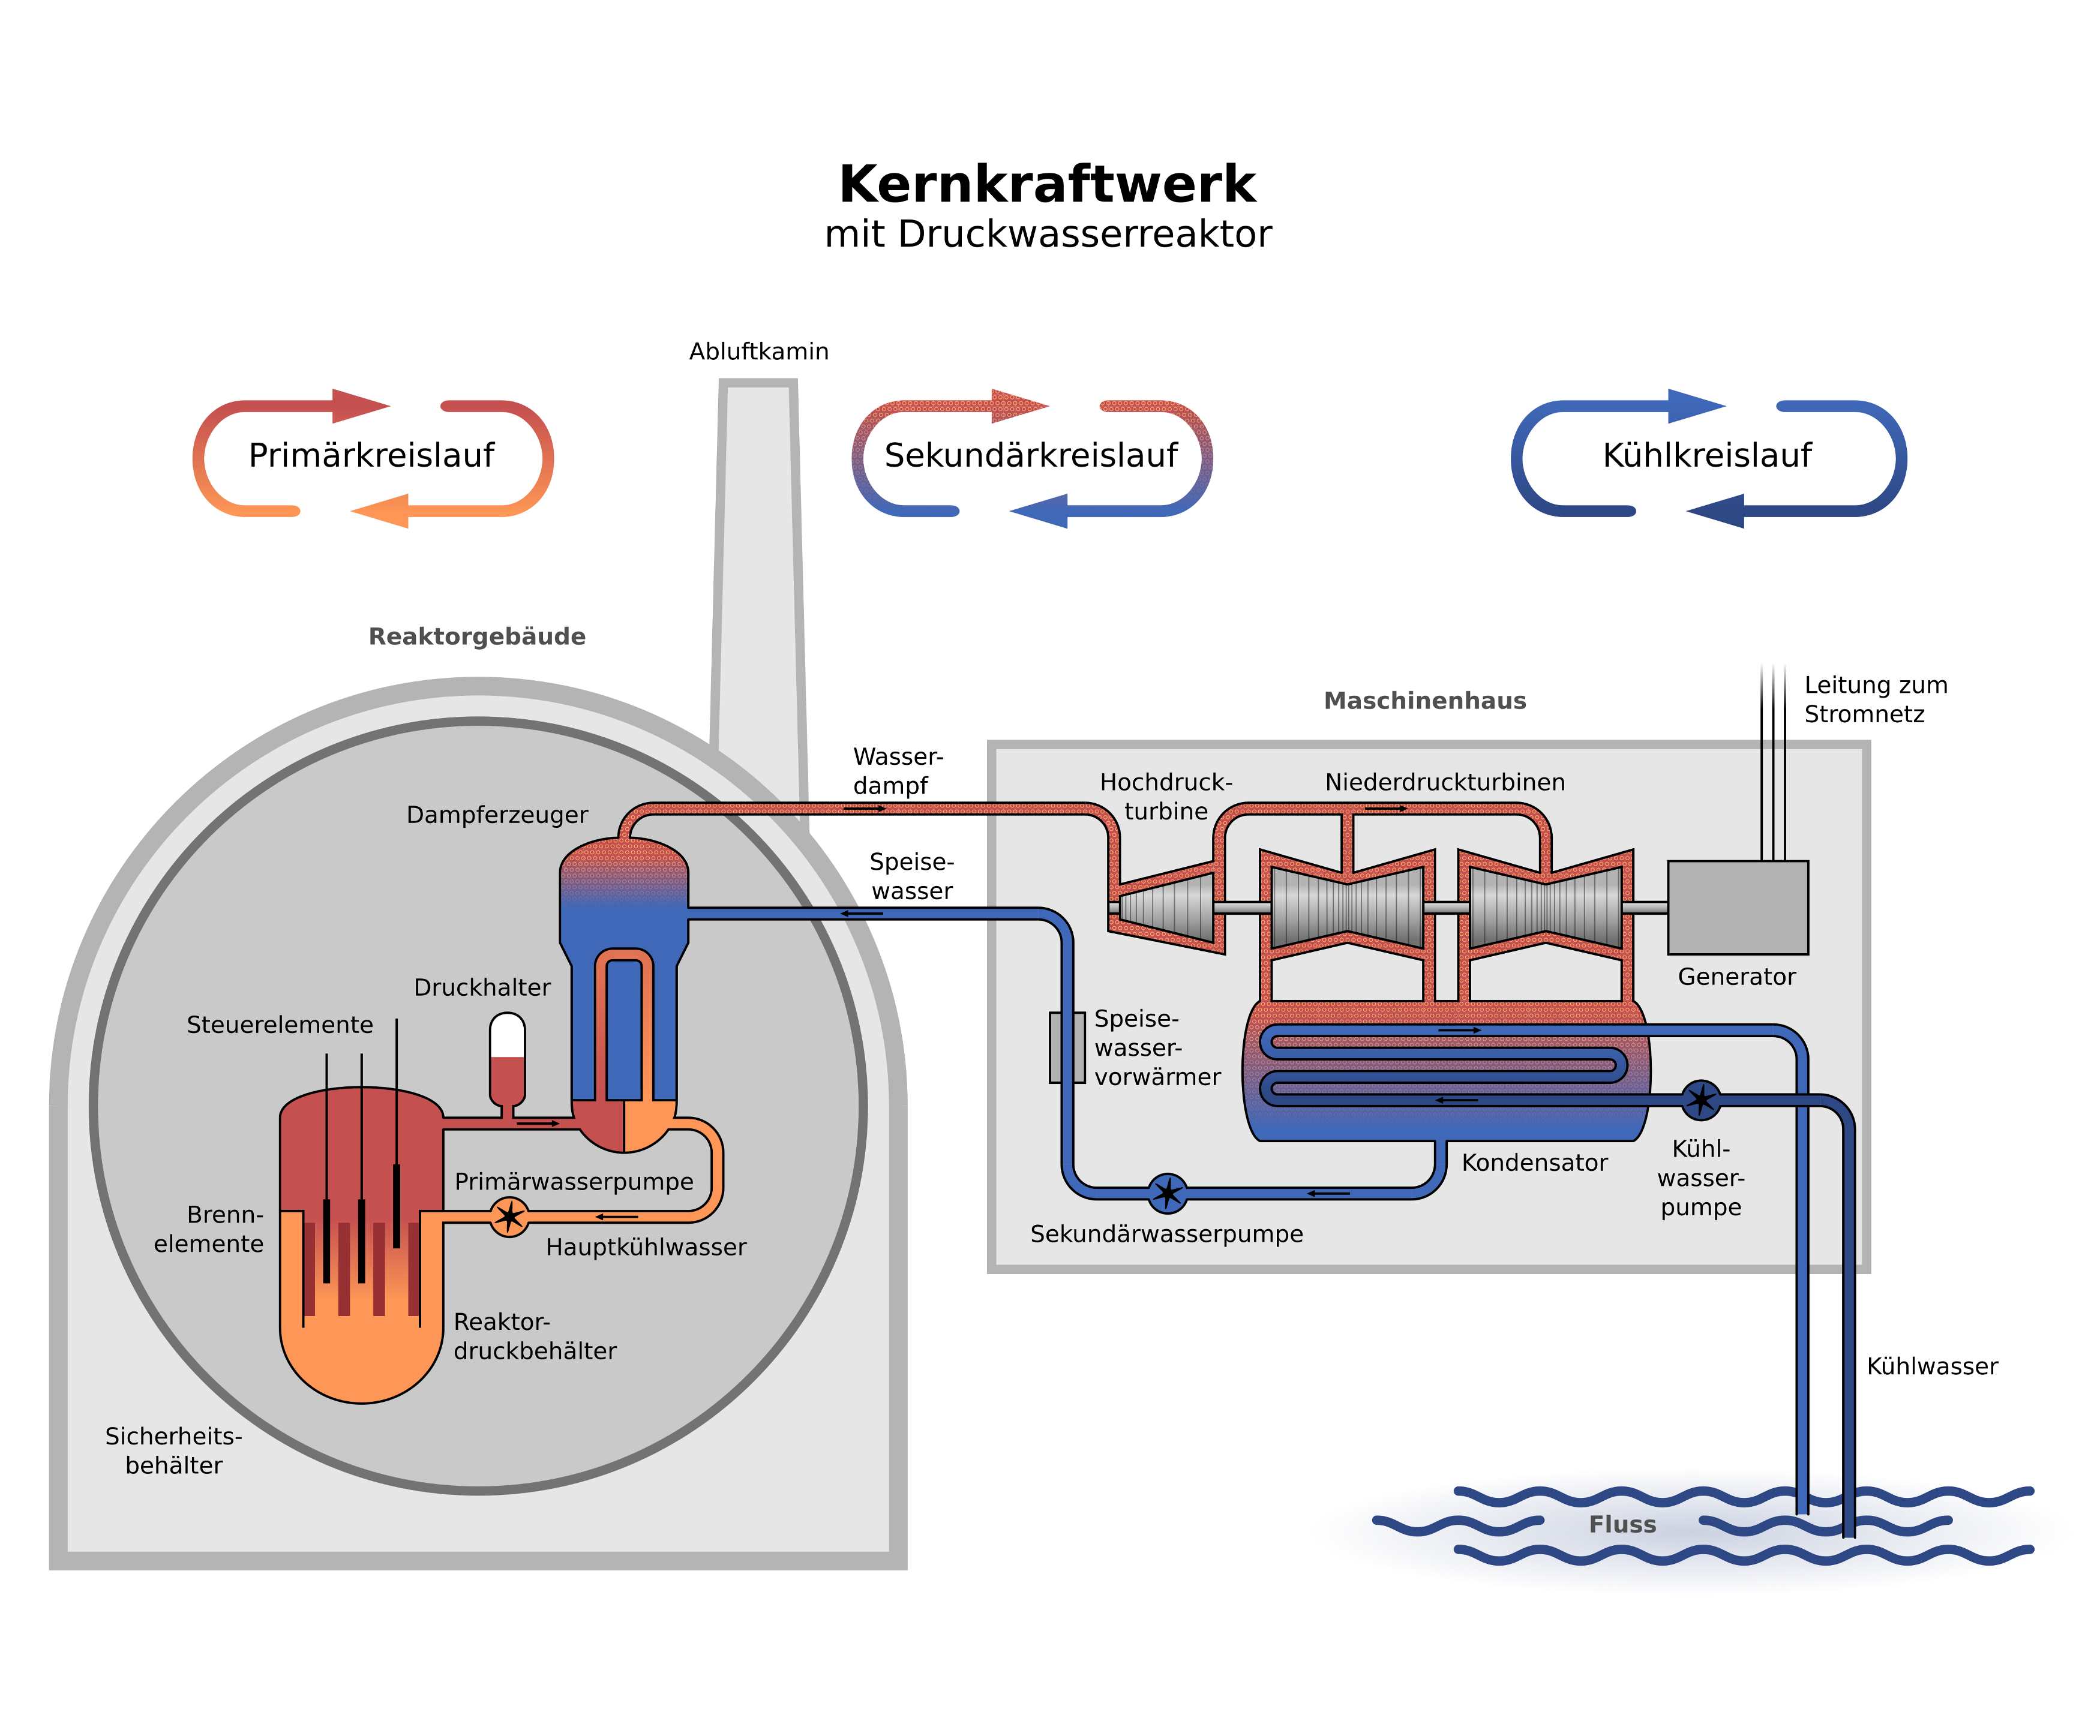 Datei:Kernkraftwerk mit Druckwasserreaktor (ohne Turm).png – Wikipedia